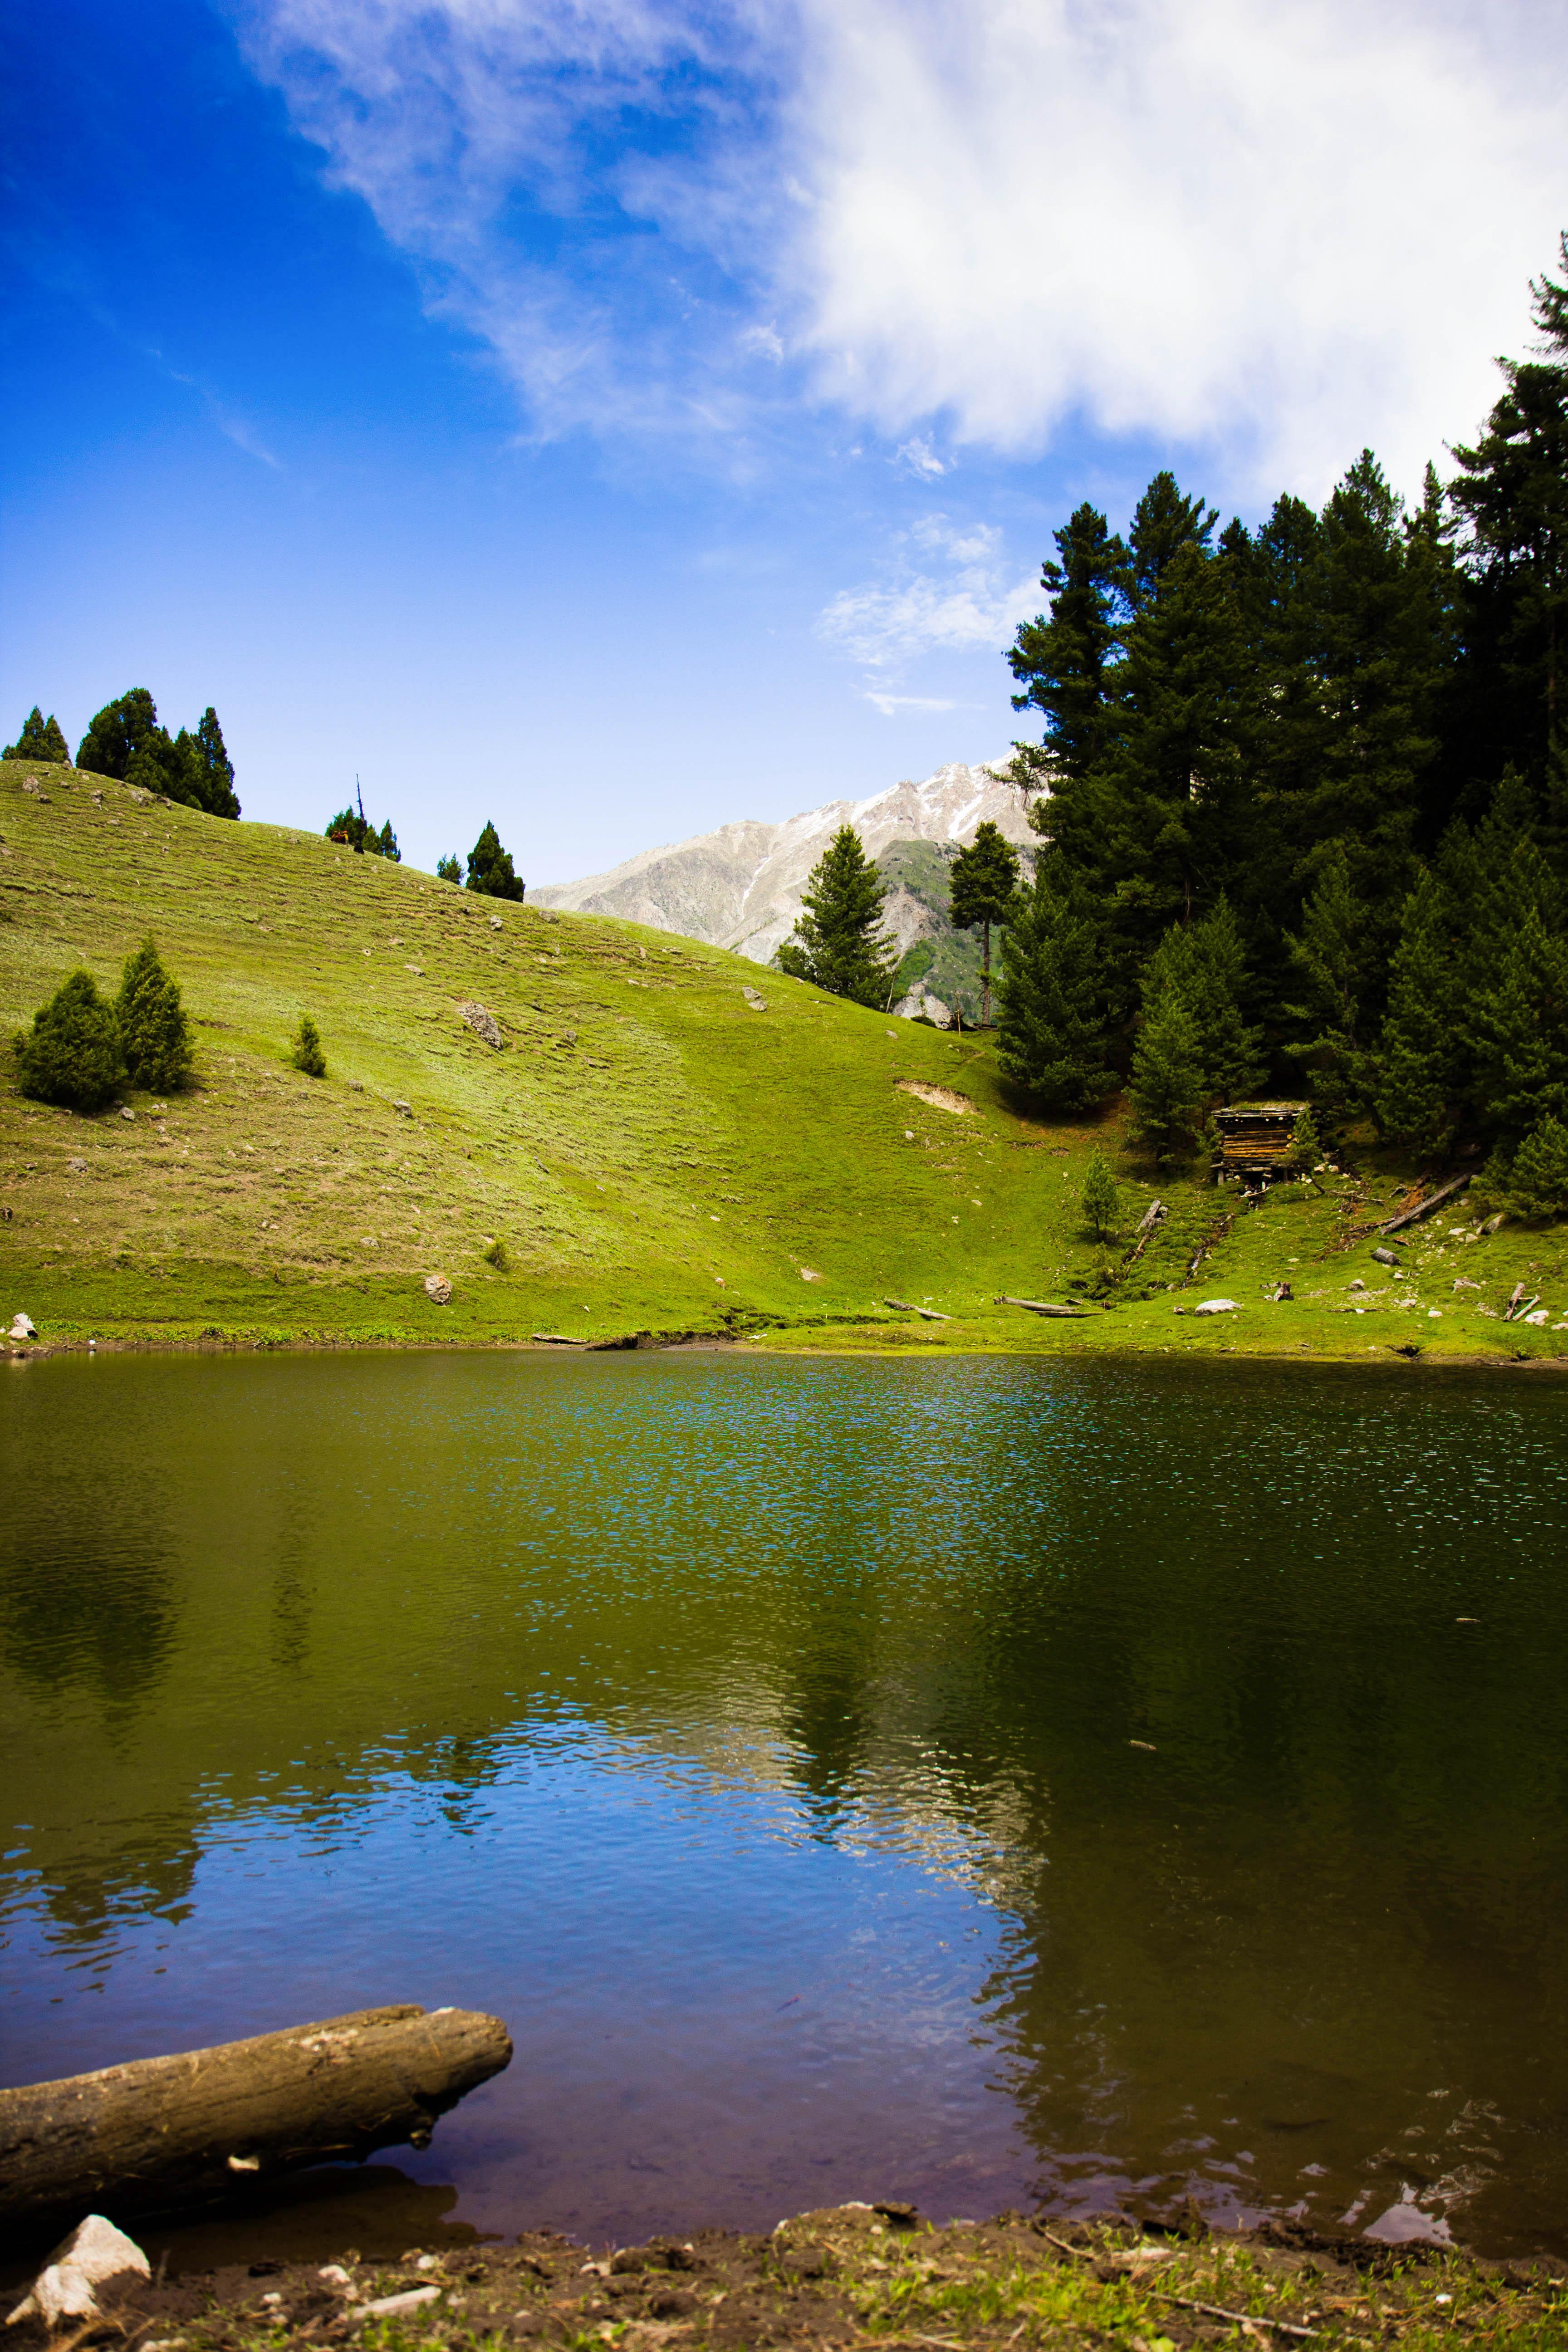 fairy meadows beautiful - photo #17